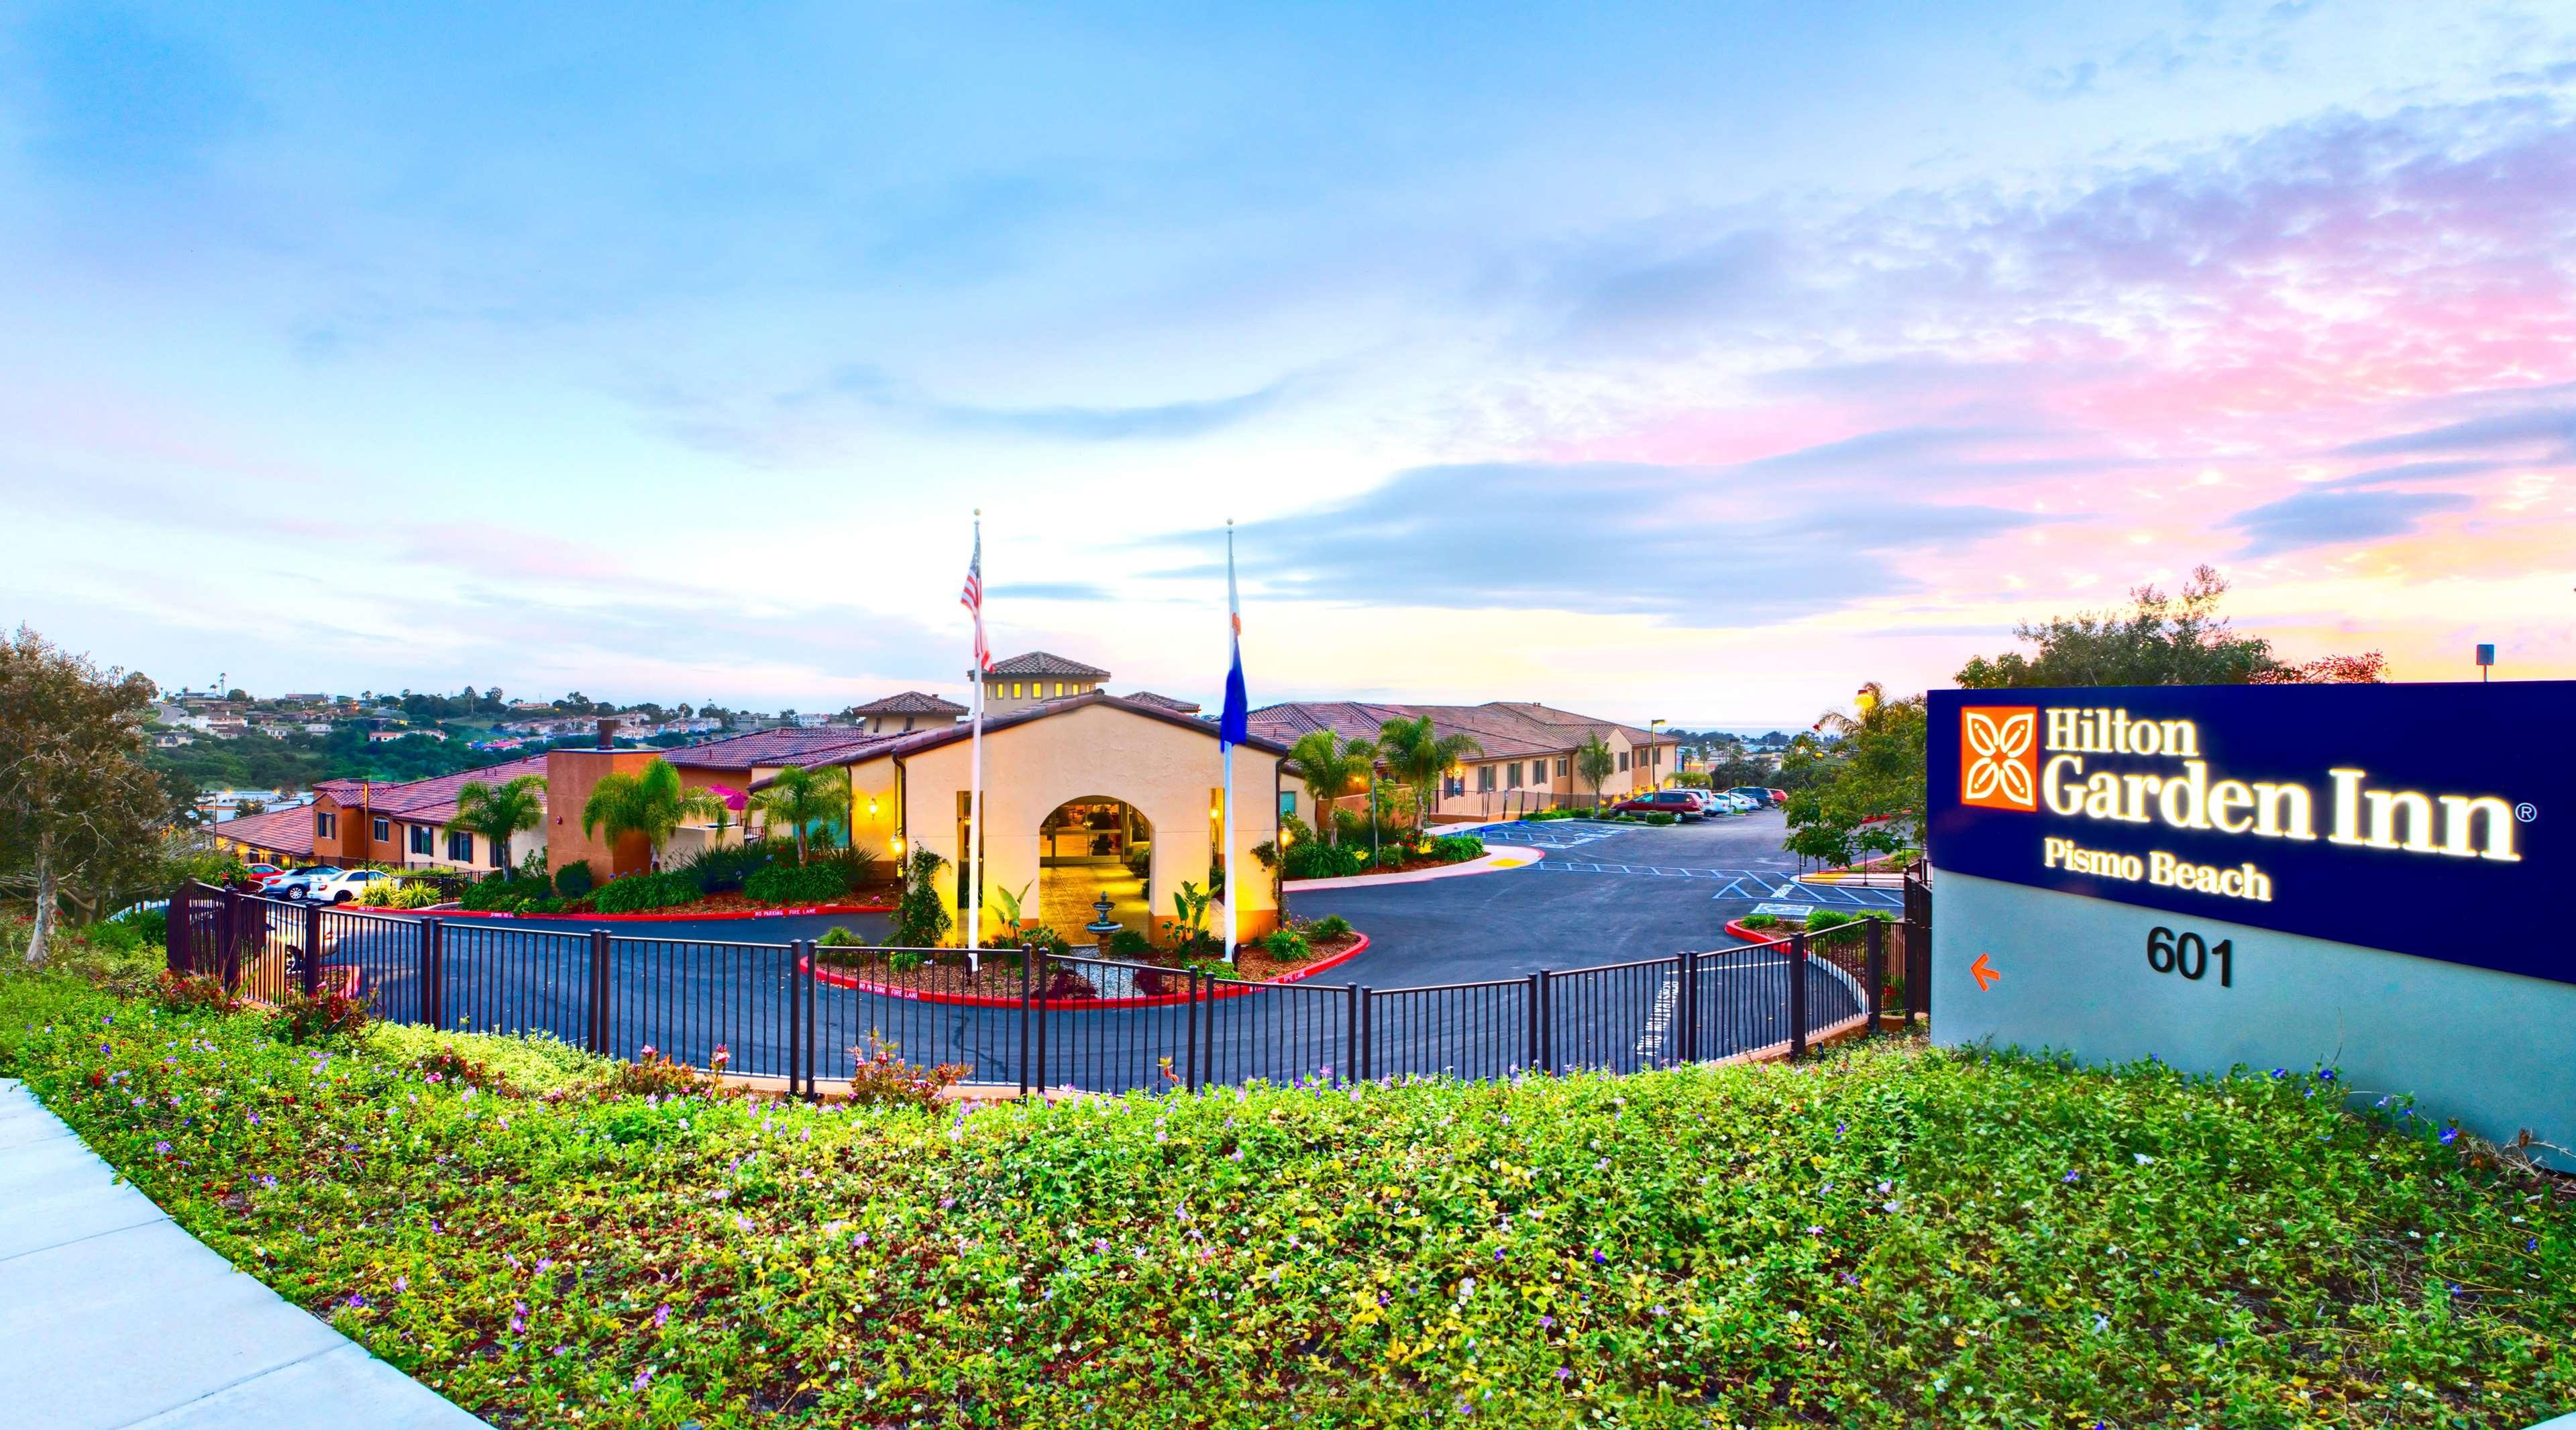 Hilton Garden Inn San Luis Obispopismo Beach 601 James Way Pismo